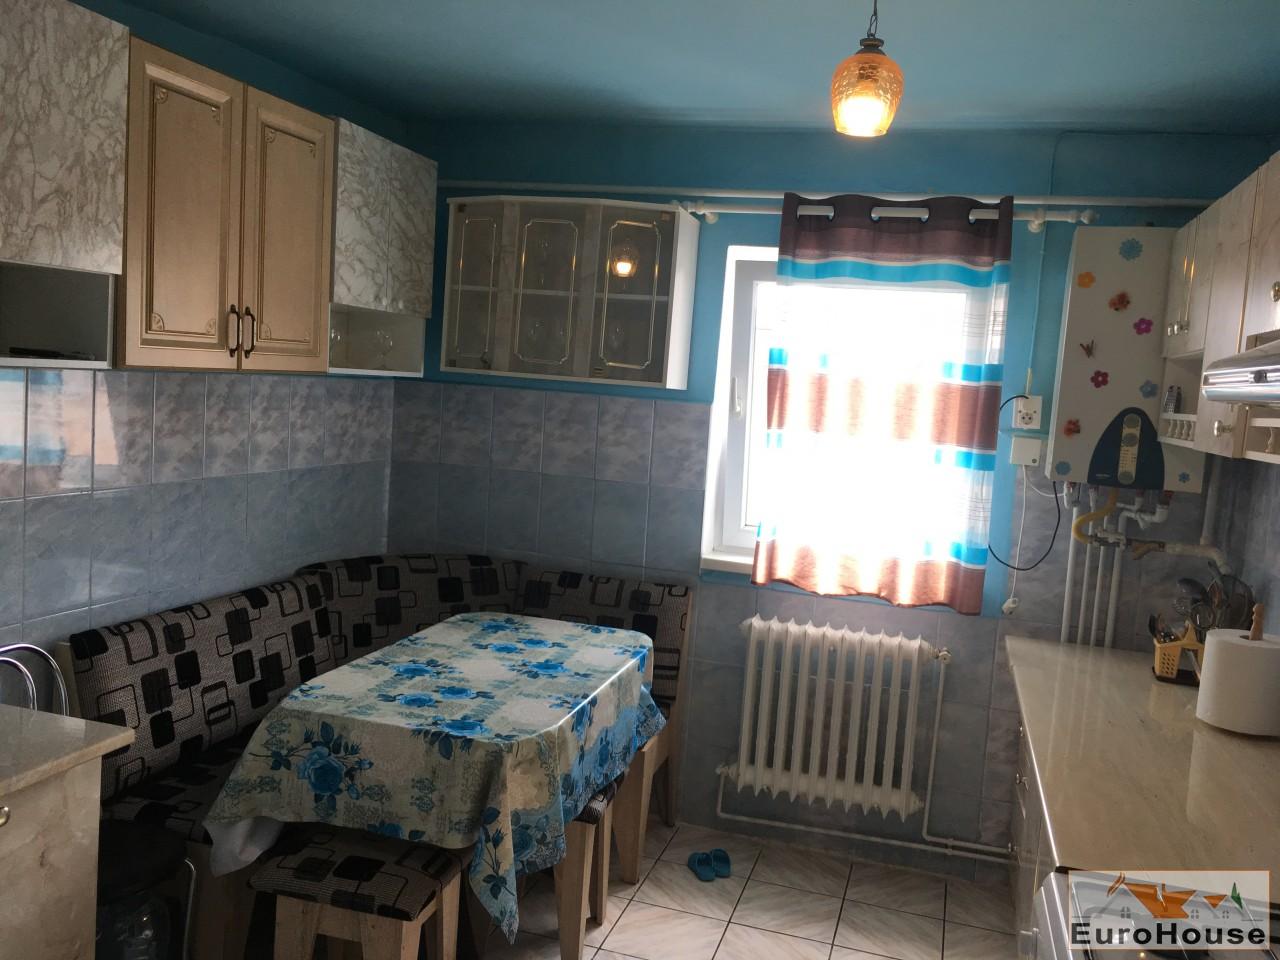 Apartament 2 camere de vanzare Alba Iulia -34048-